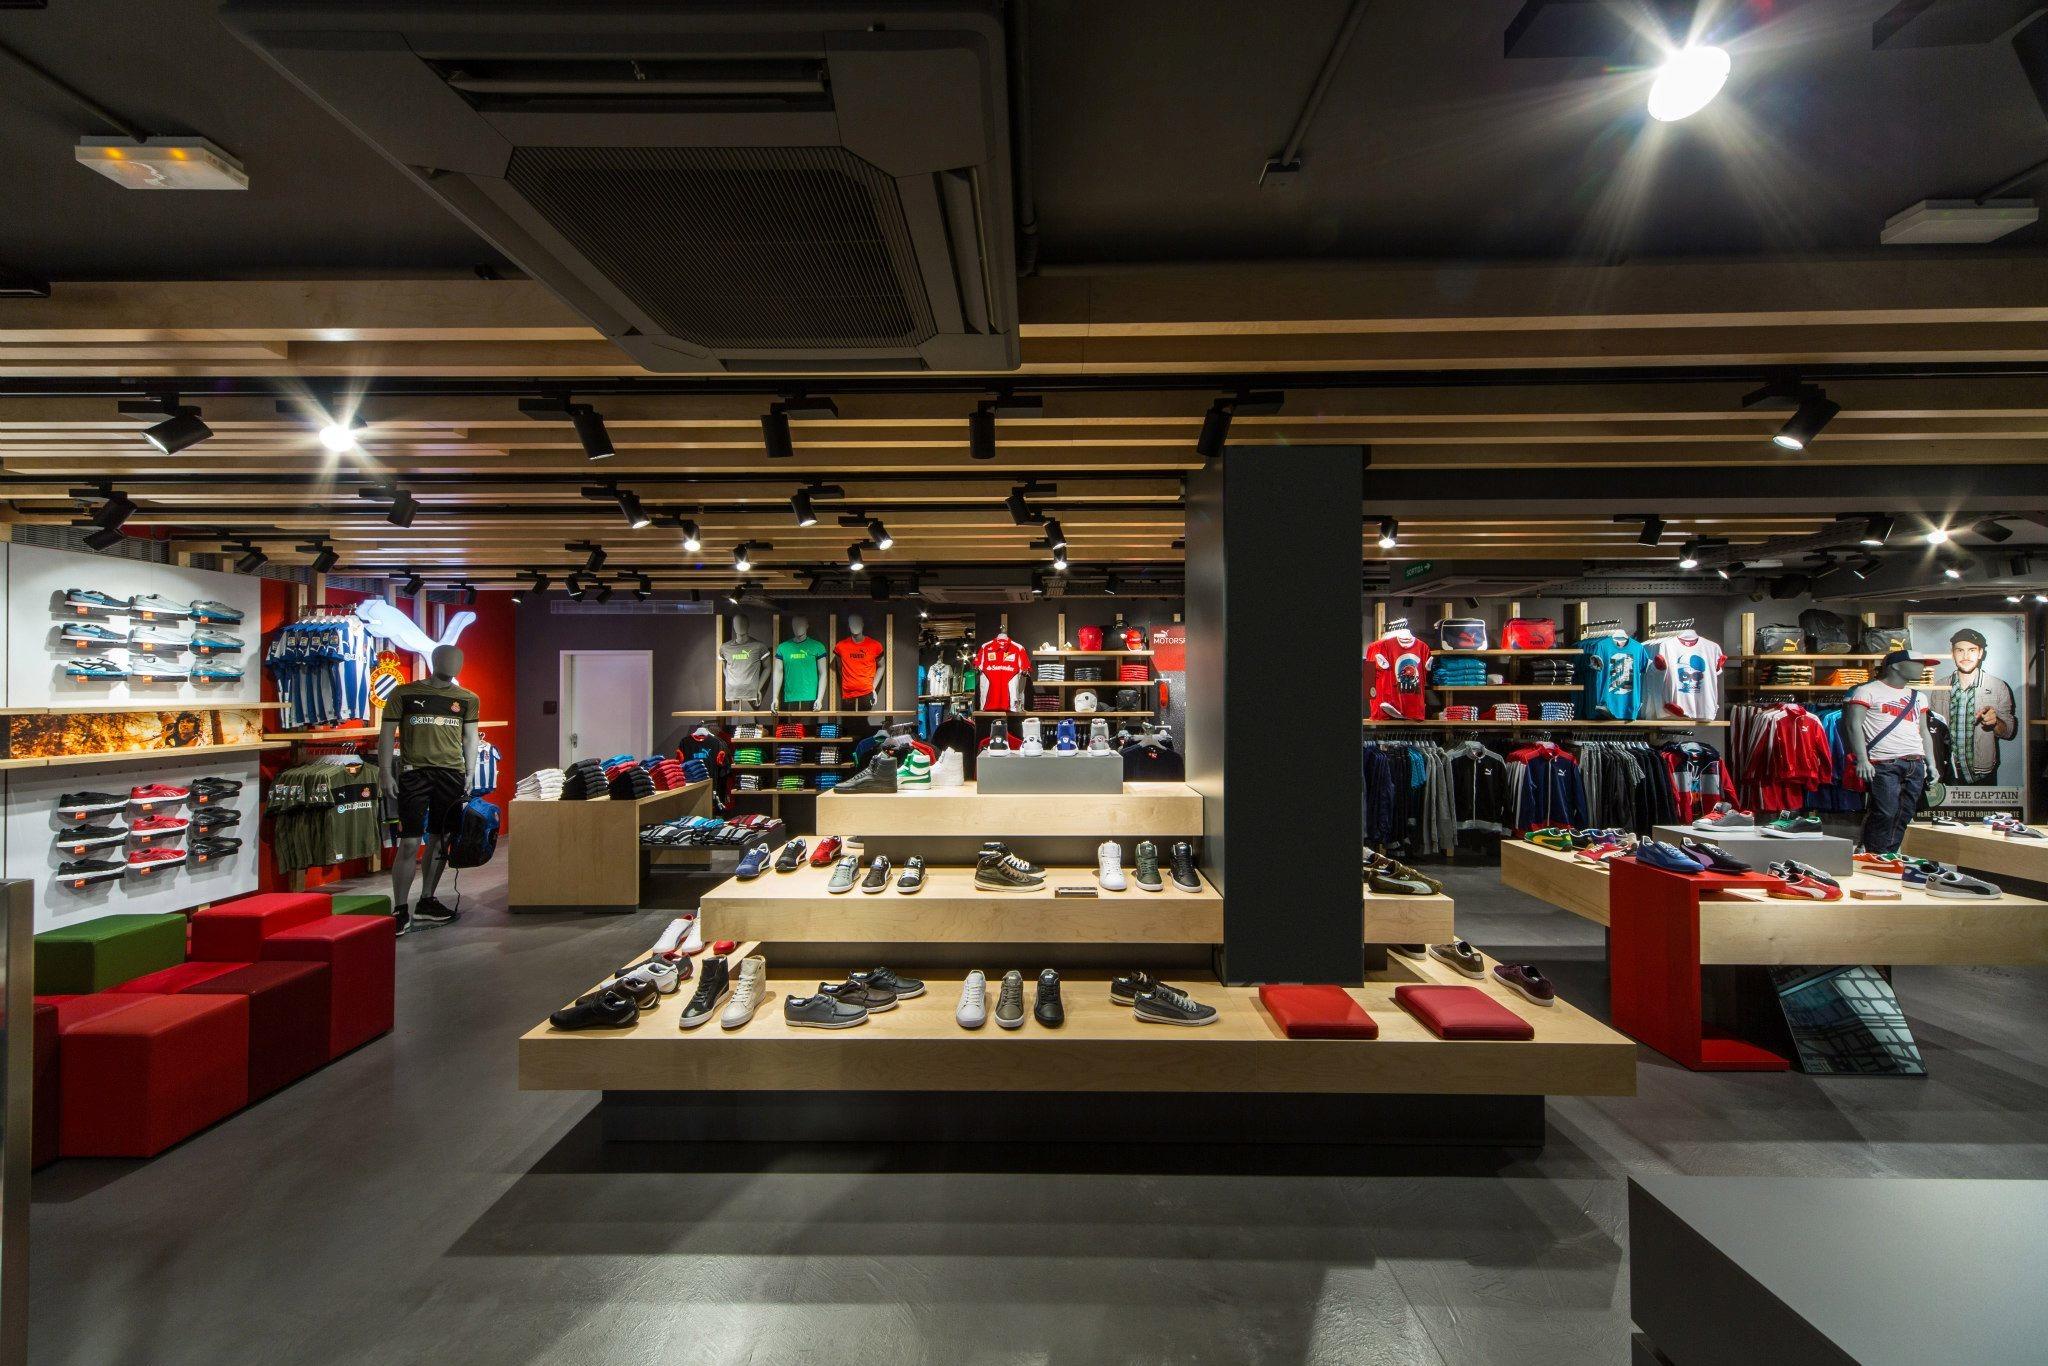 nouveau concept 18718 ed15a Puma Shop in Barcelona - Events and Guide - Barcelona Home